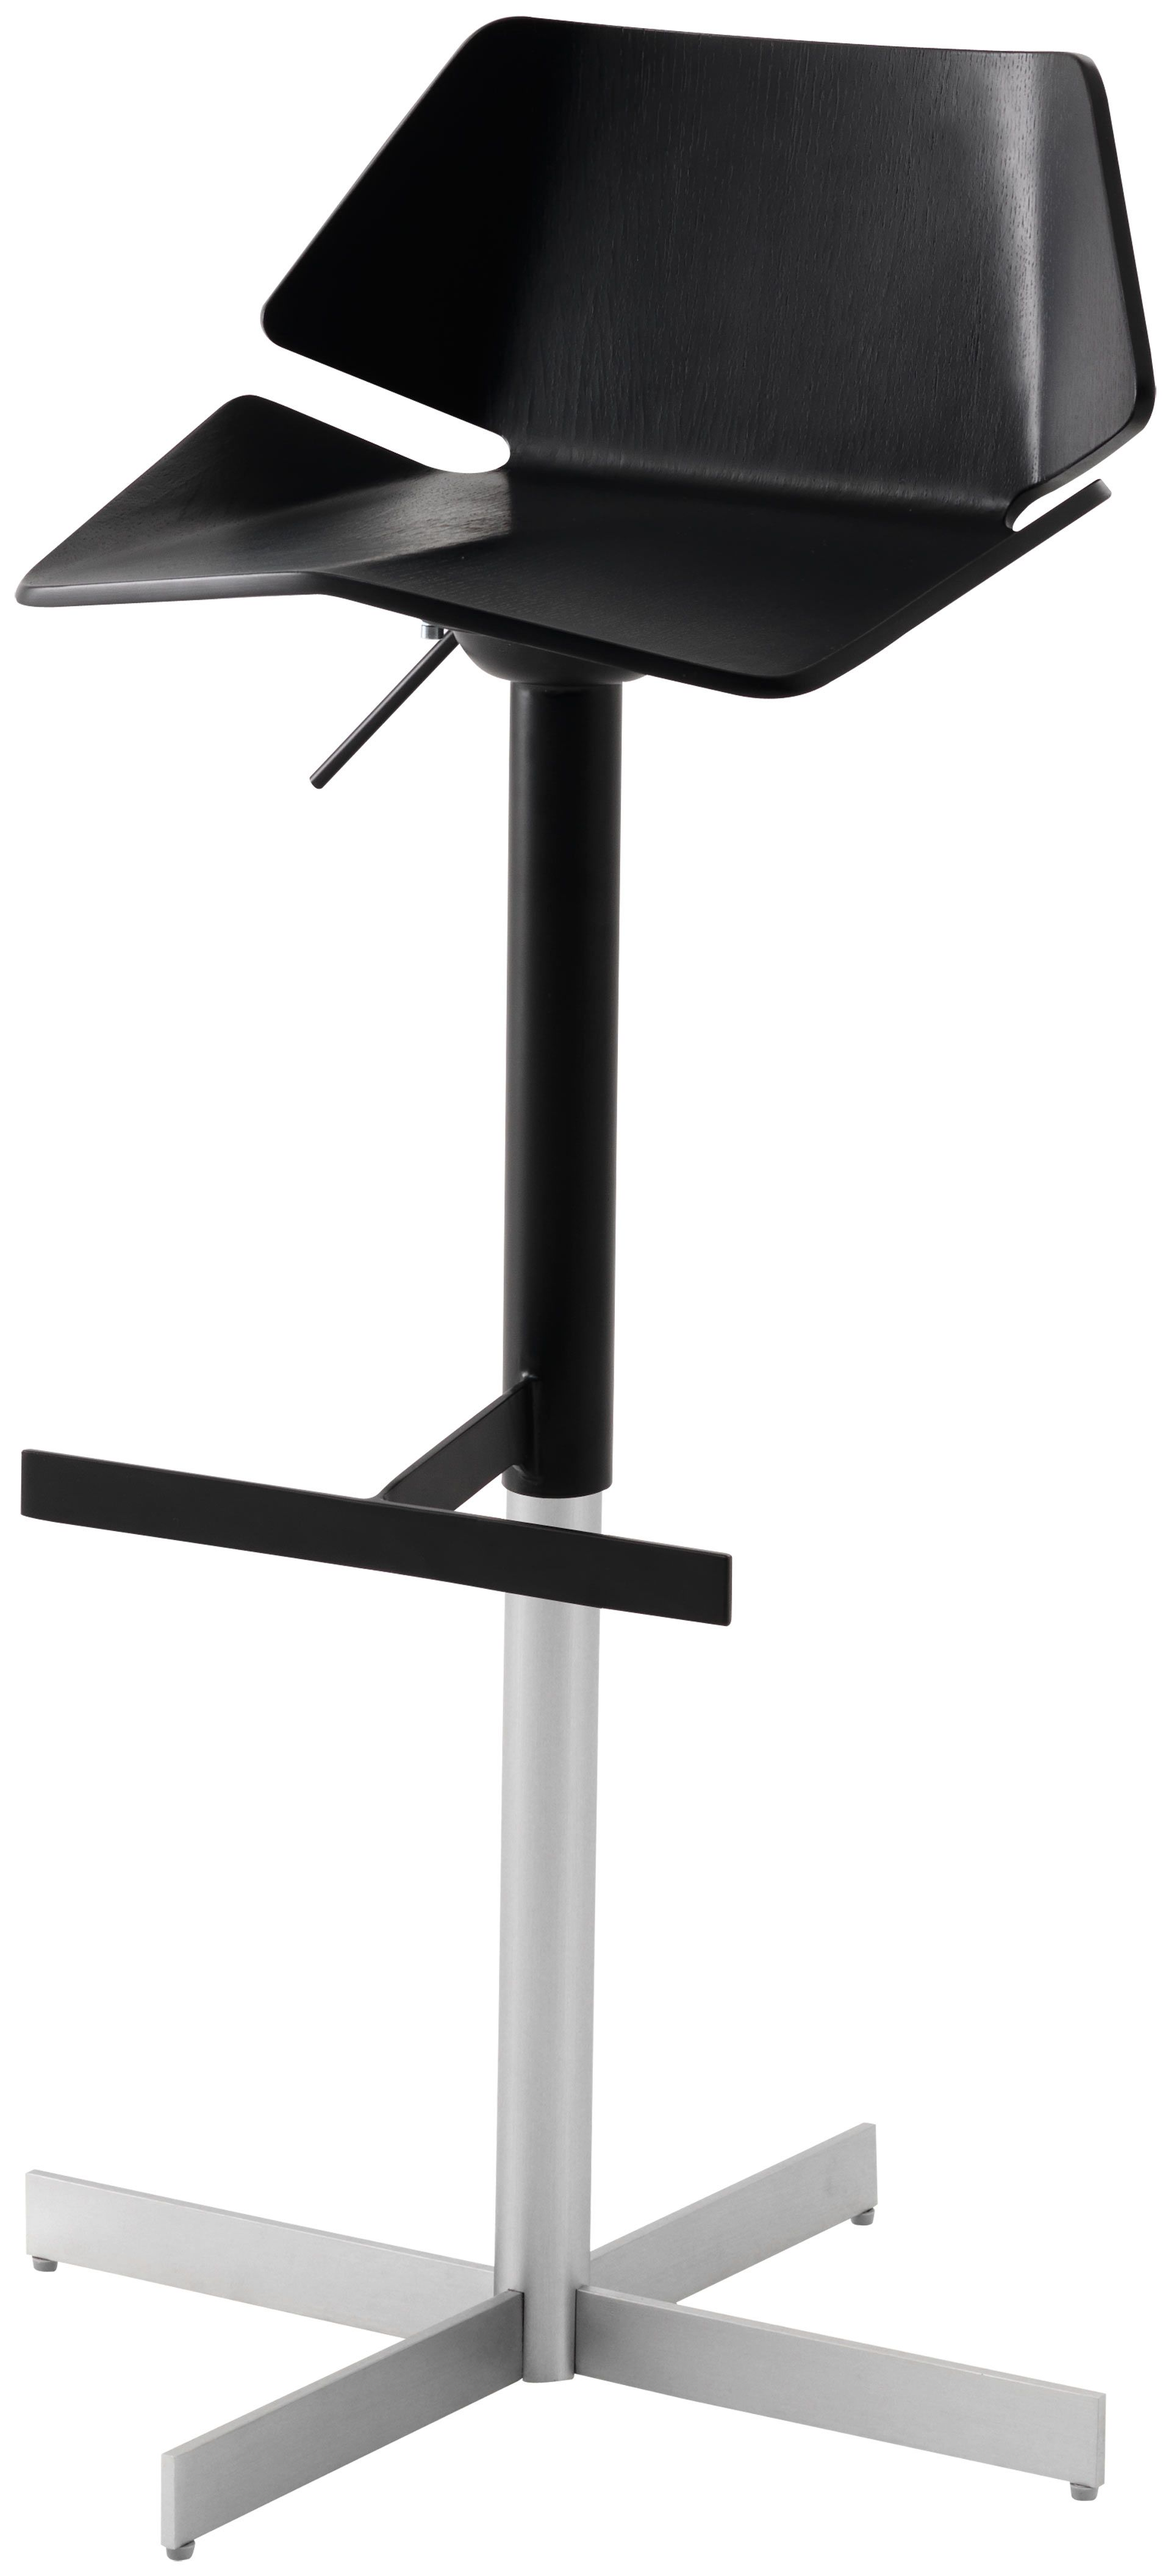 $369 / Modern Barstools - Contemporary Barstools - BoConcept ...